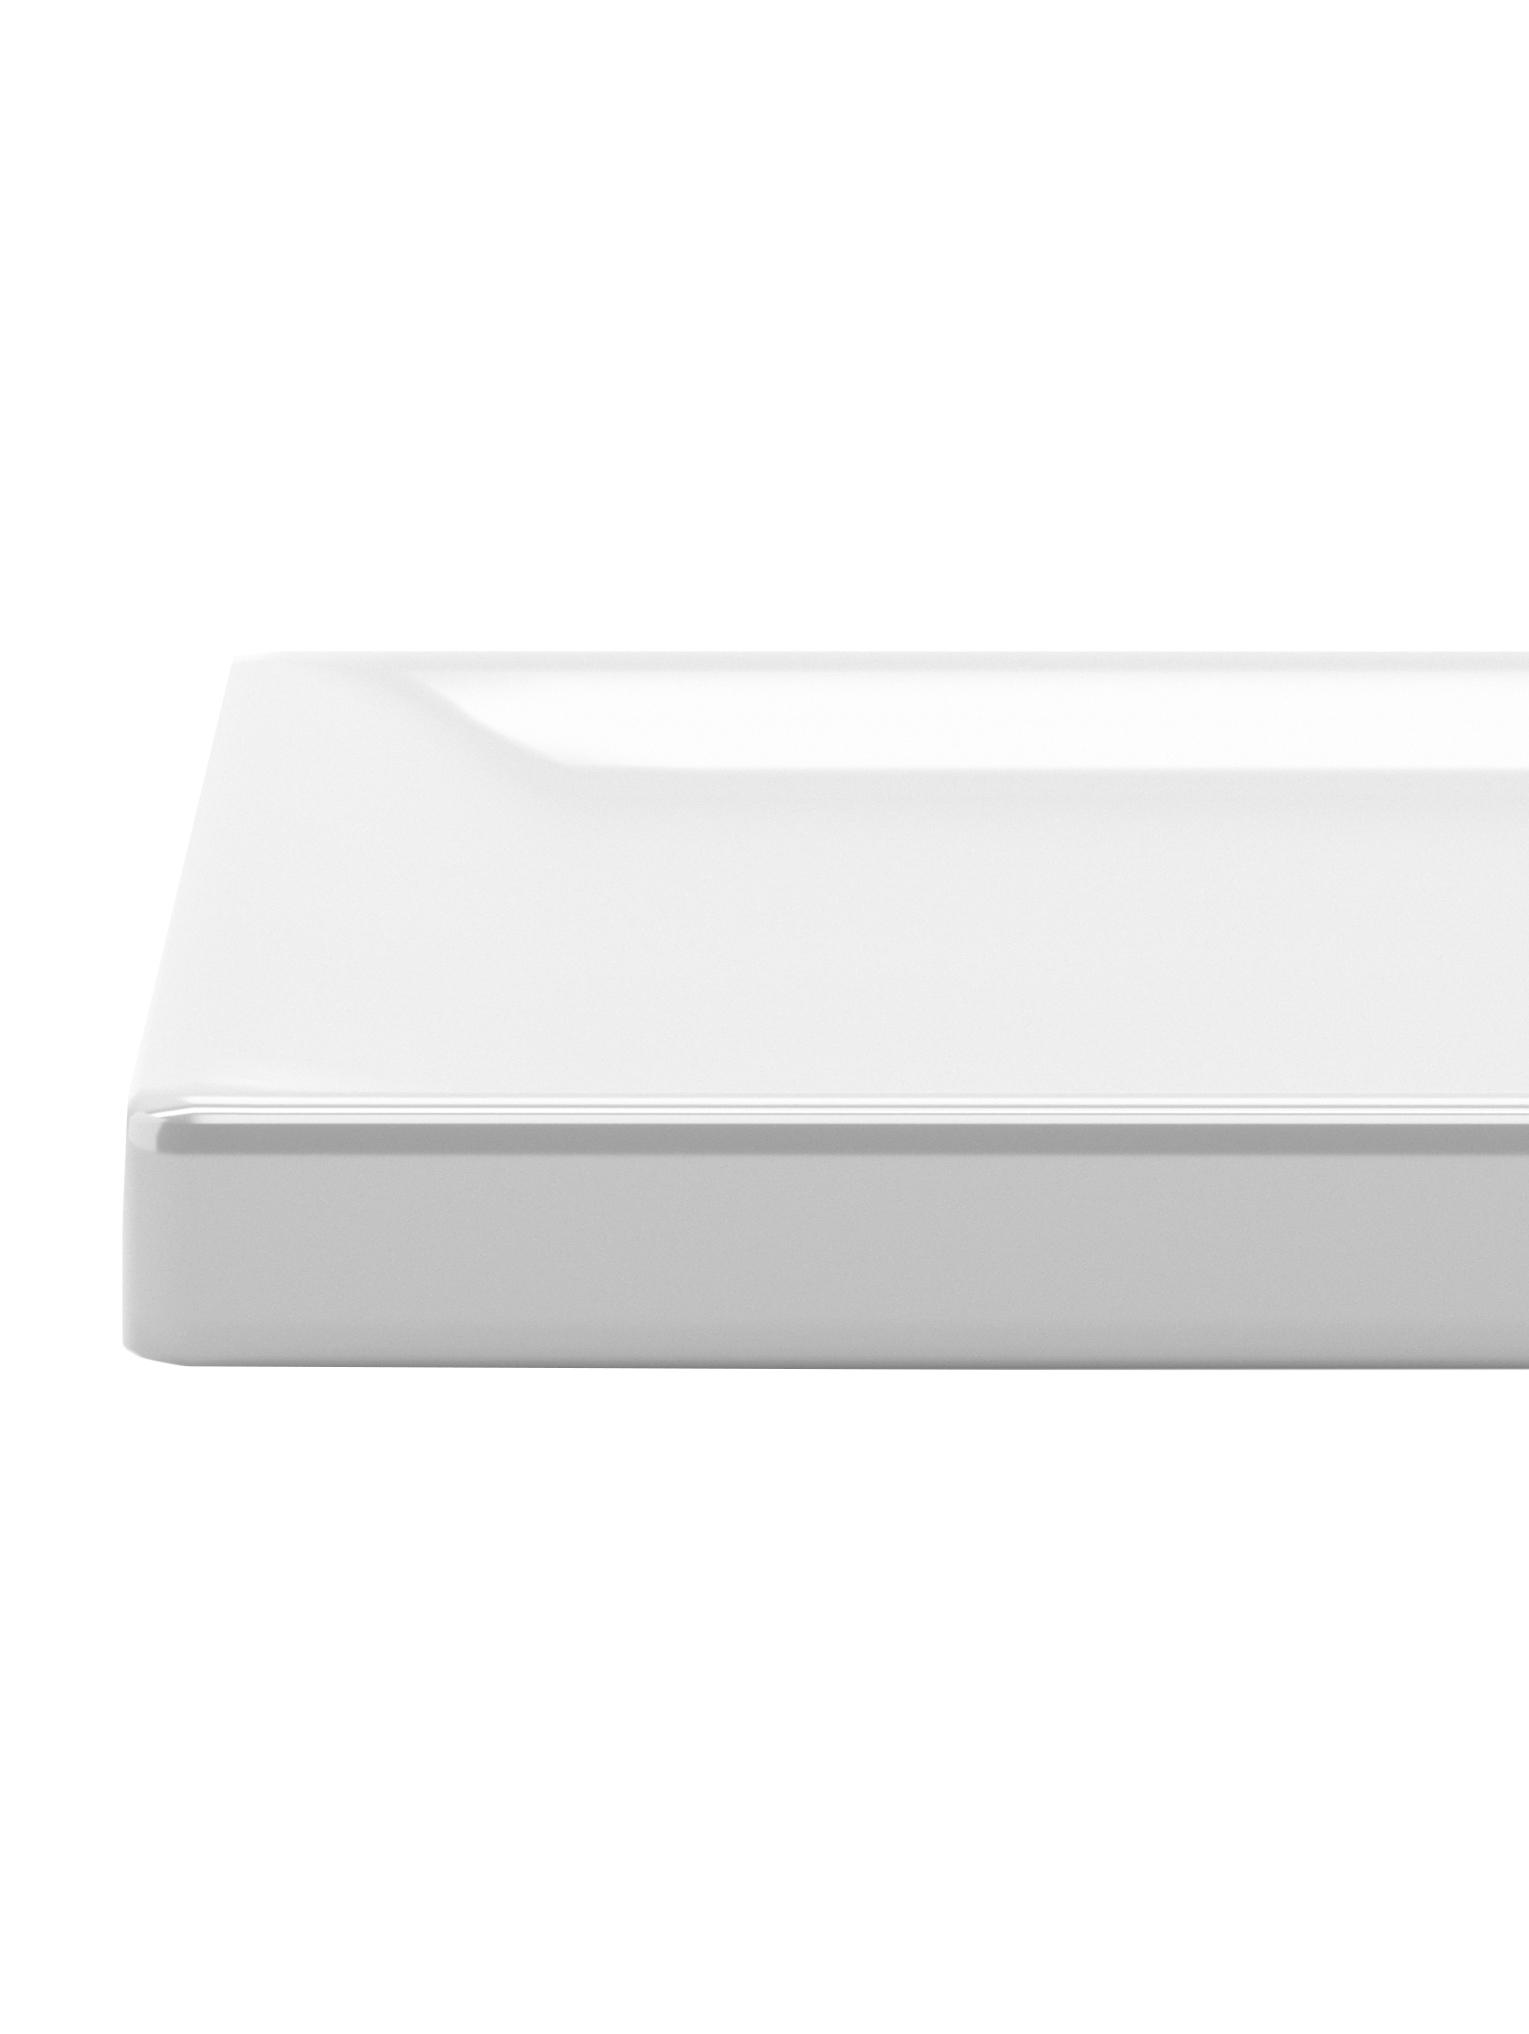 Schmuckhalter Trigem, Gestell: Metall, vernickelt, Fuß: Metall, lackiert, Nickel, Weiß, 23 x 48 cm